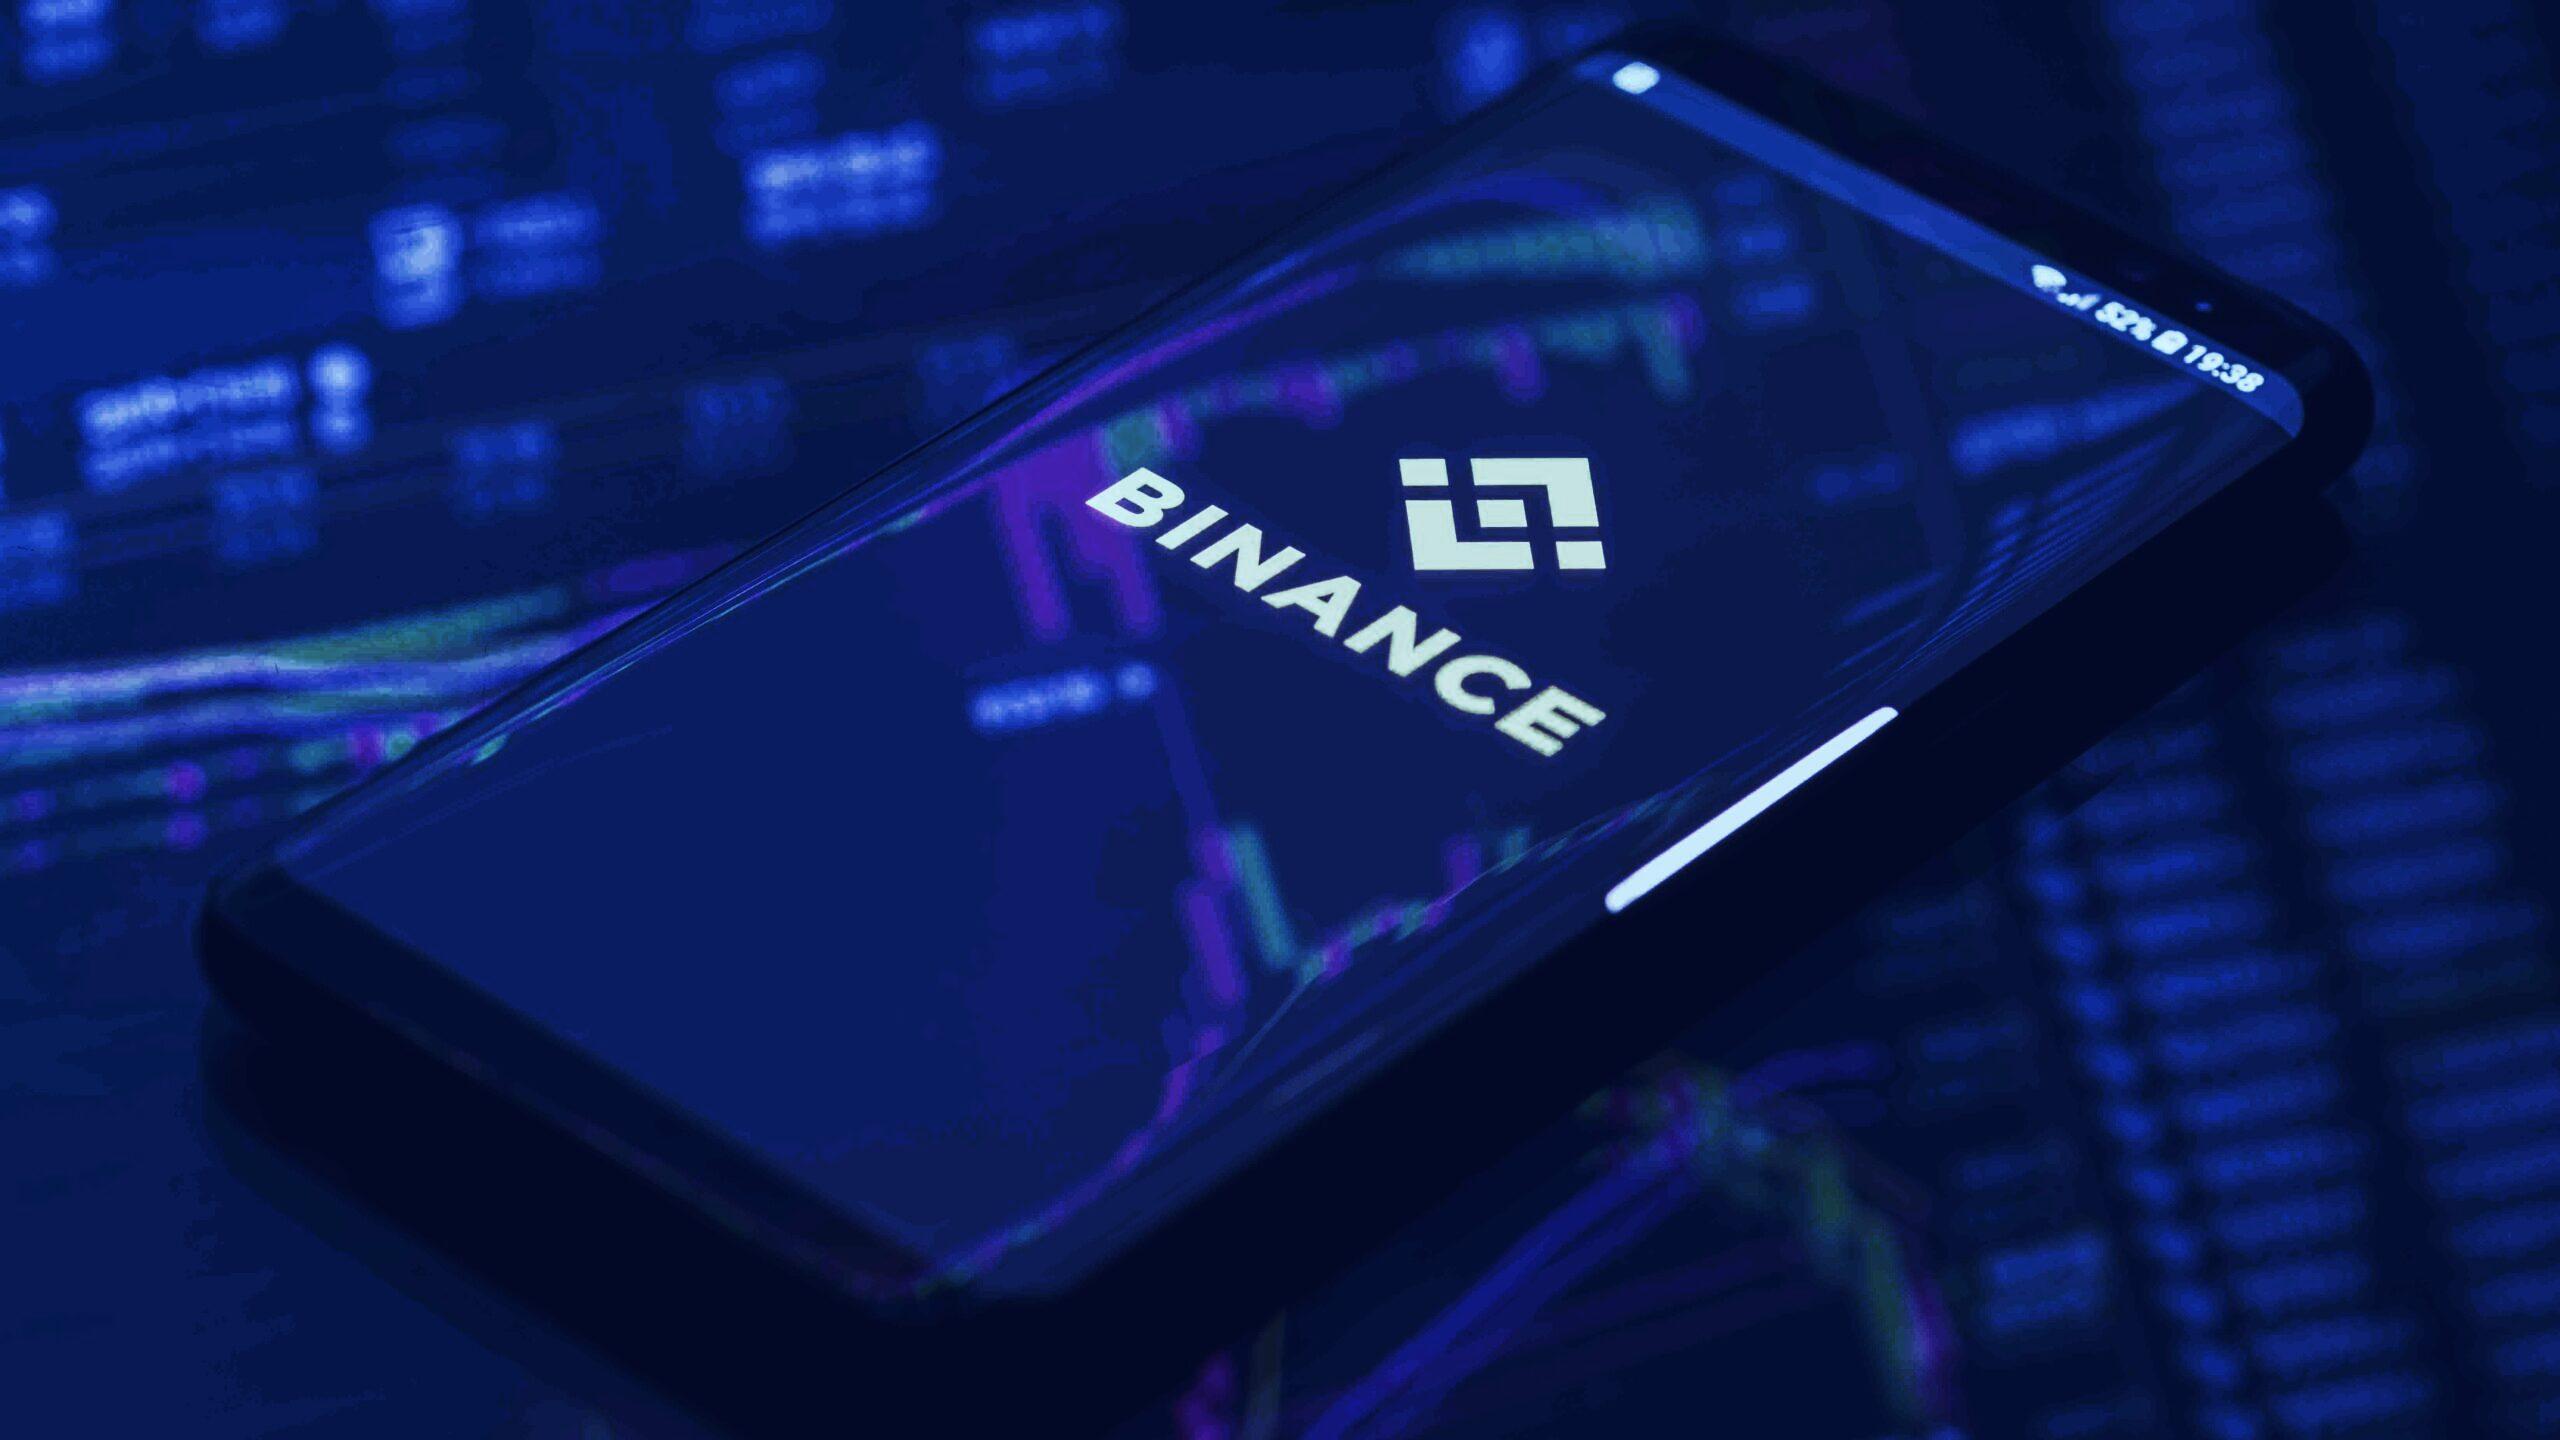 Crypto Exchange Binance Halts Operations for Its Tesla, Facebook, Google Stock Tokens